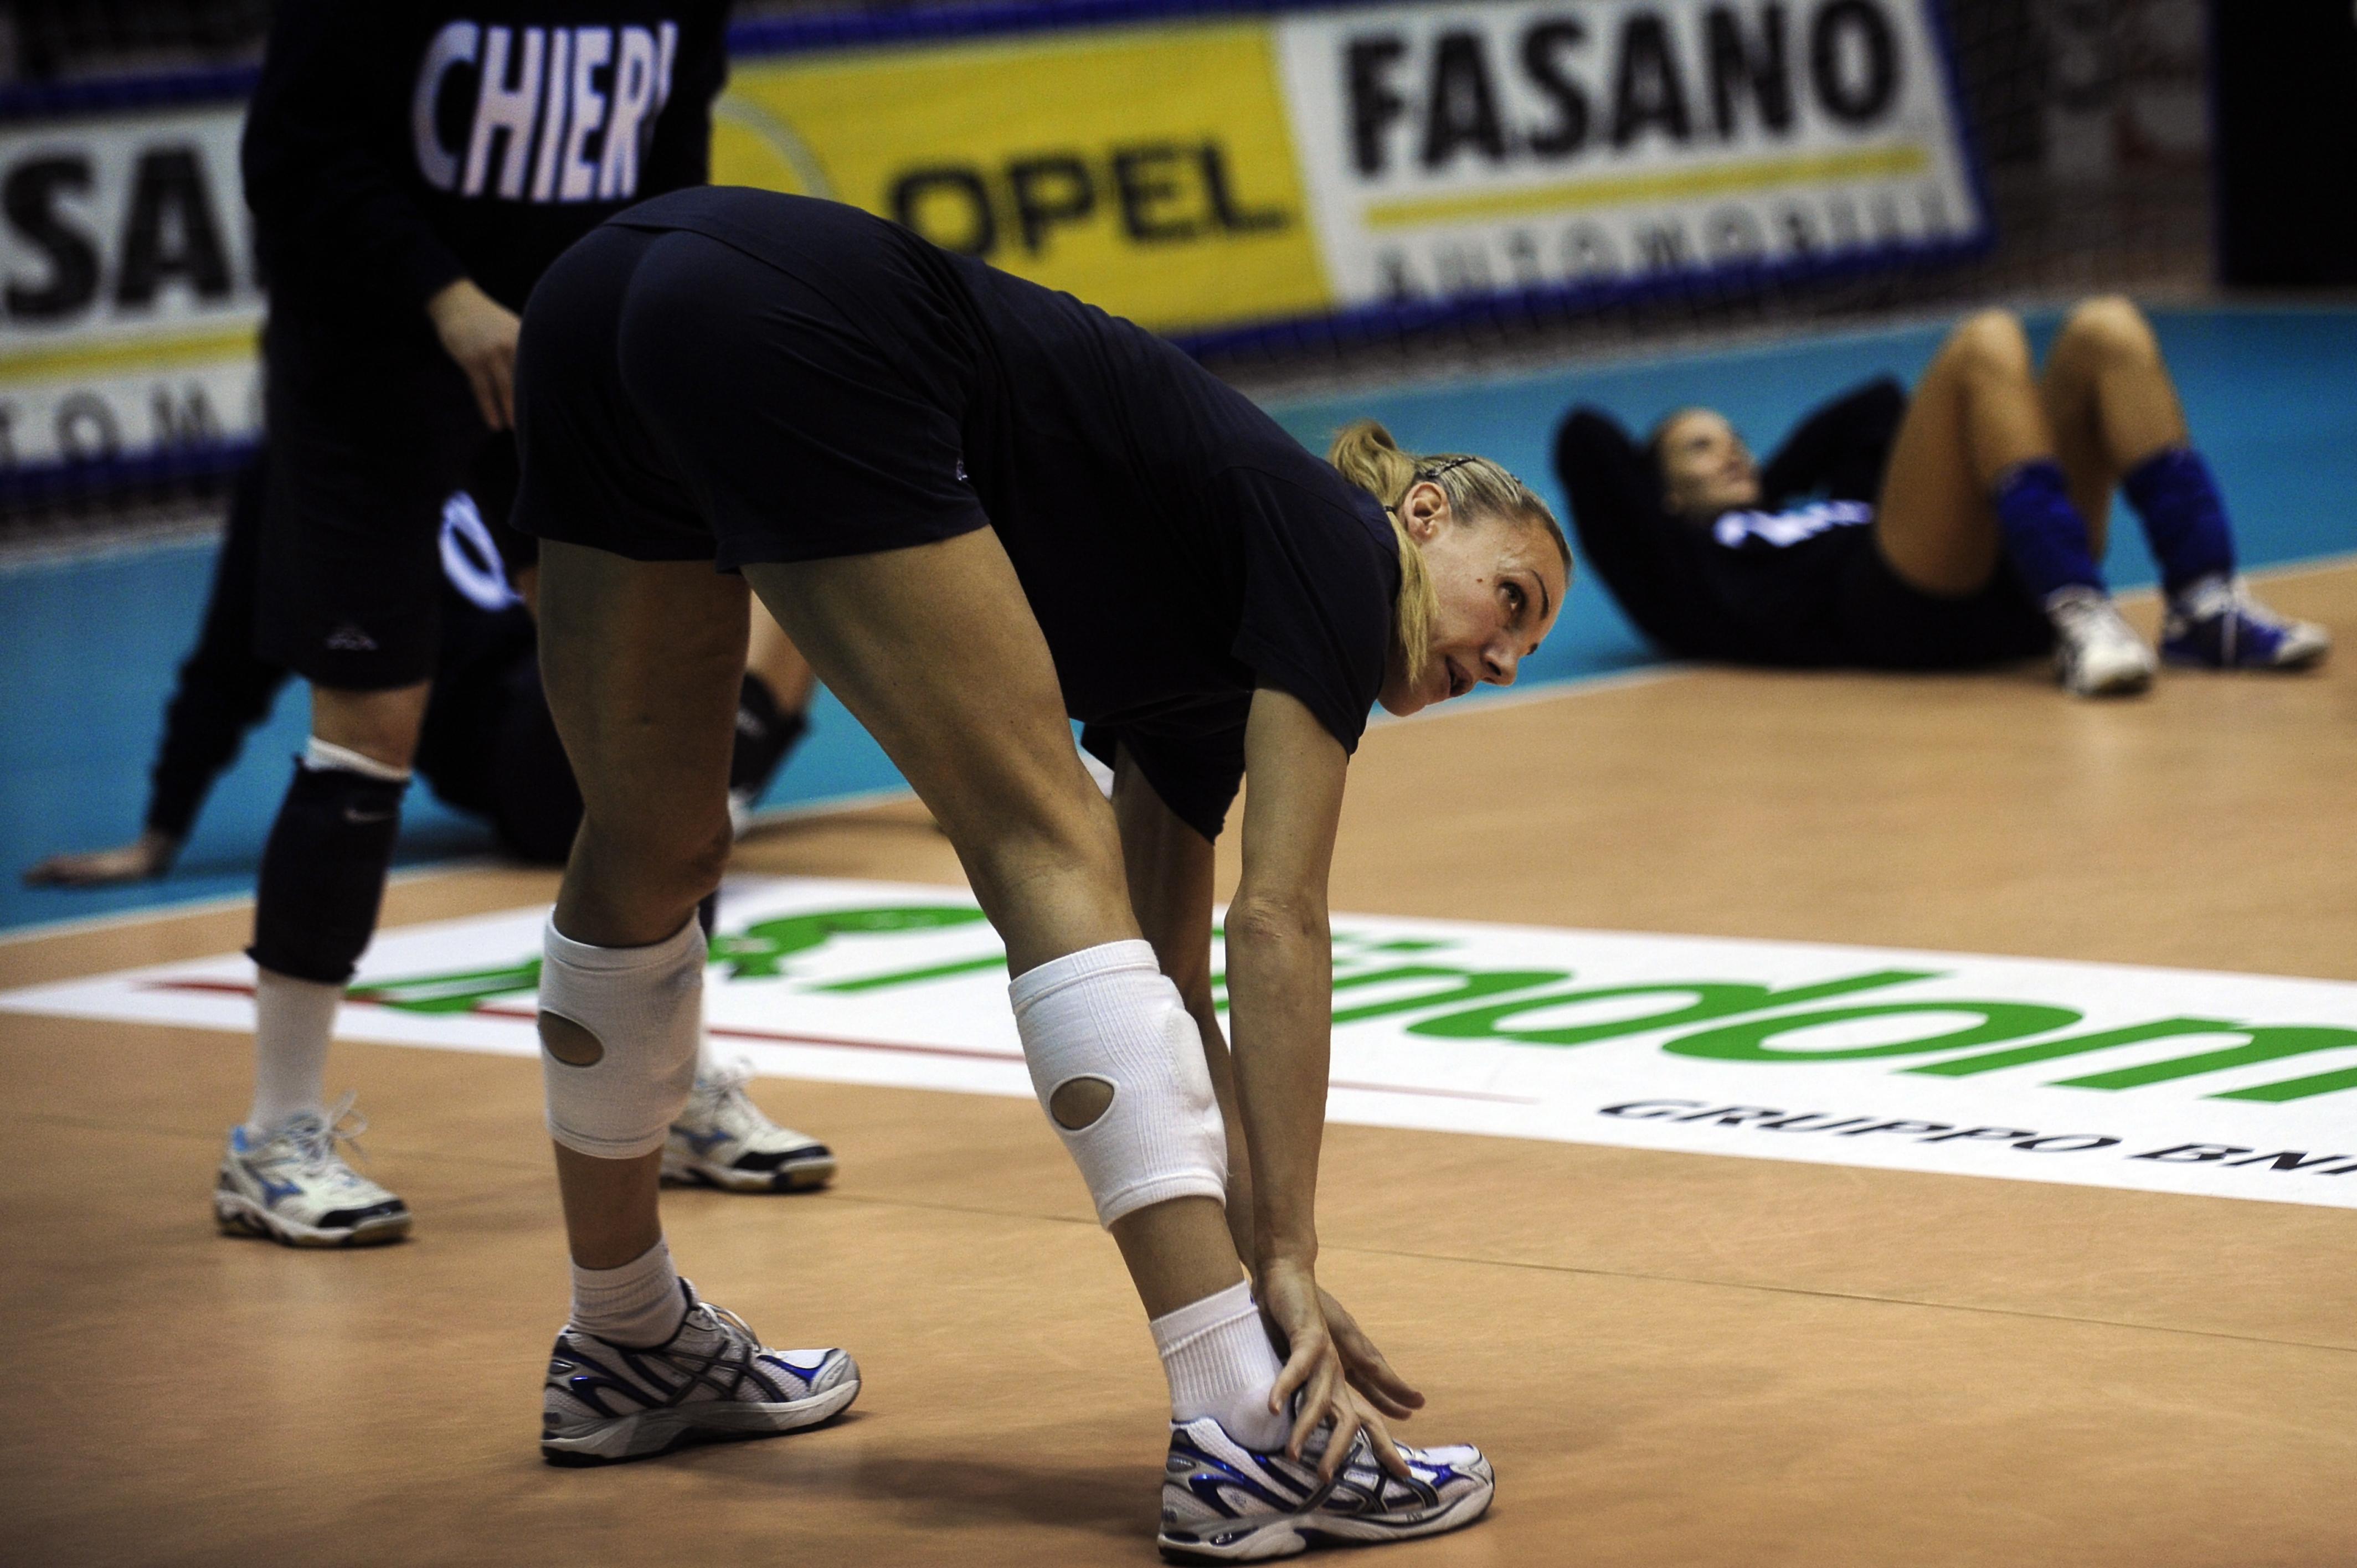 Torino Chieri Volley - Foto Massimo Pinca